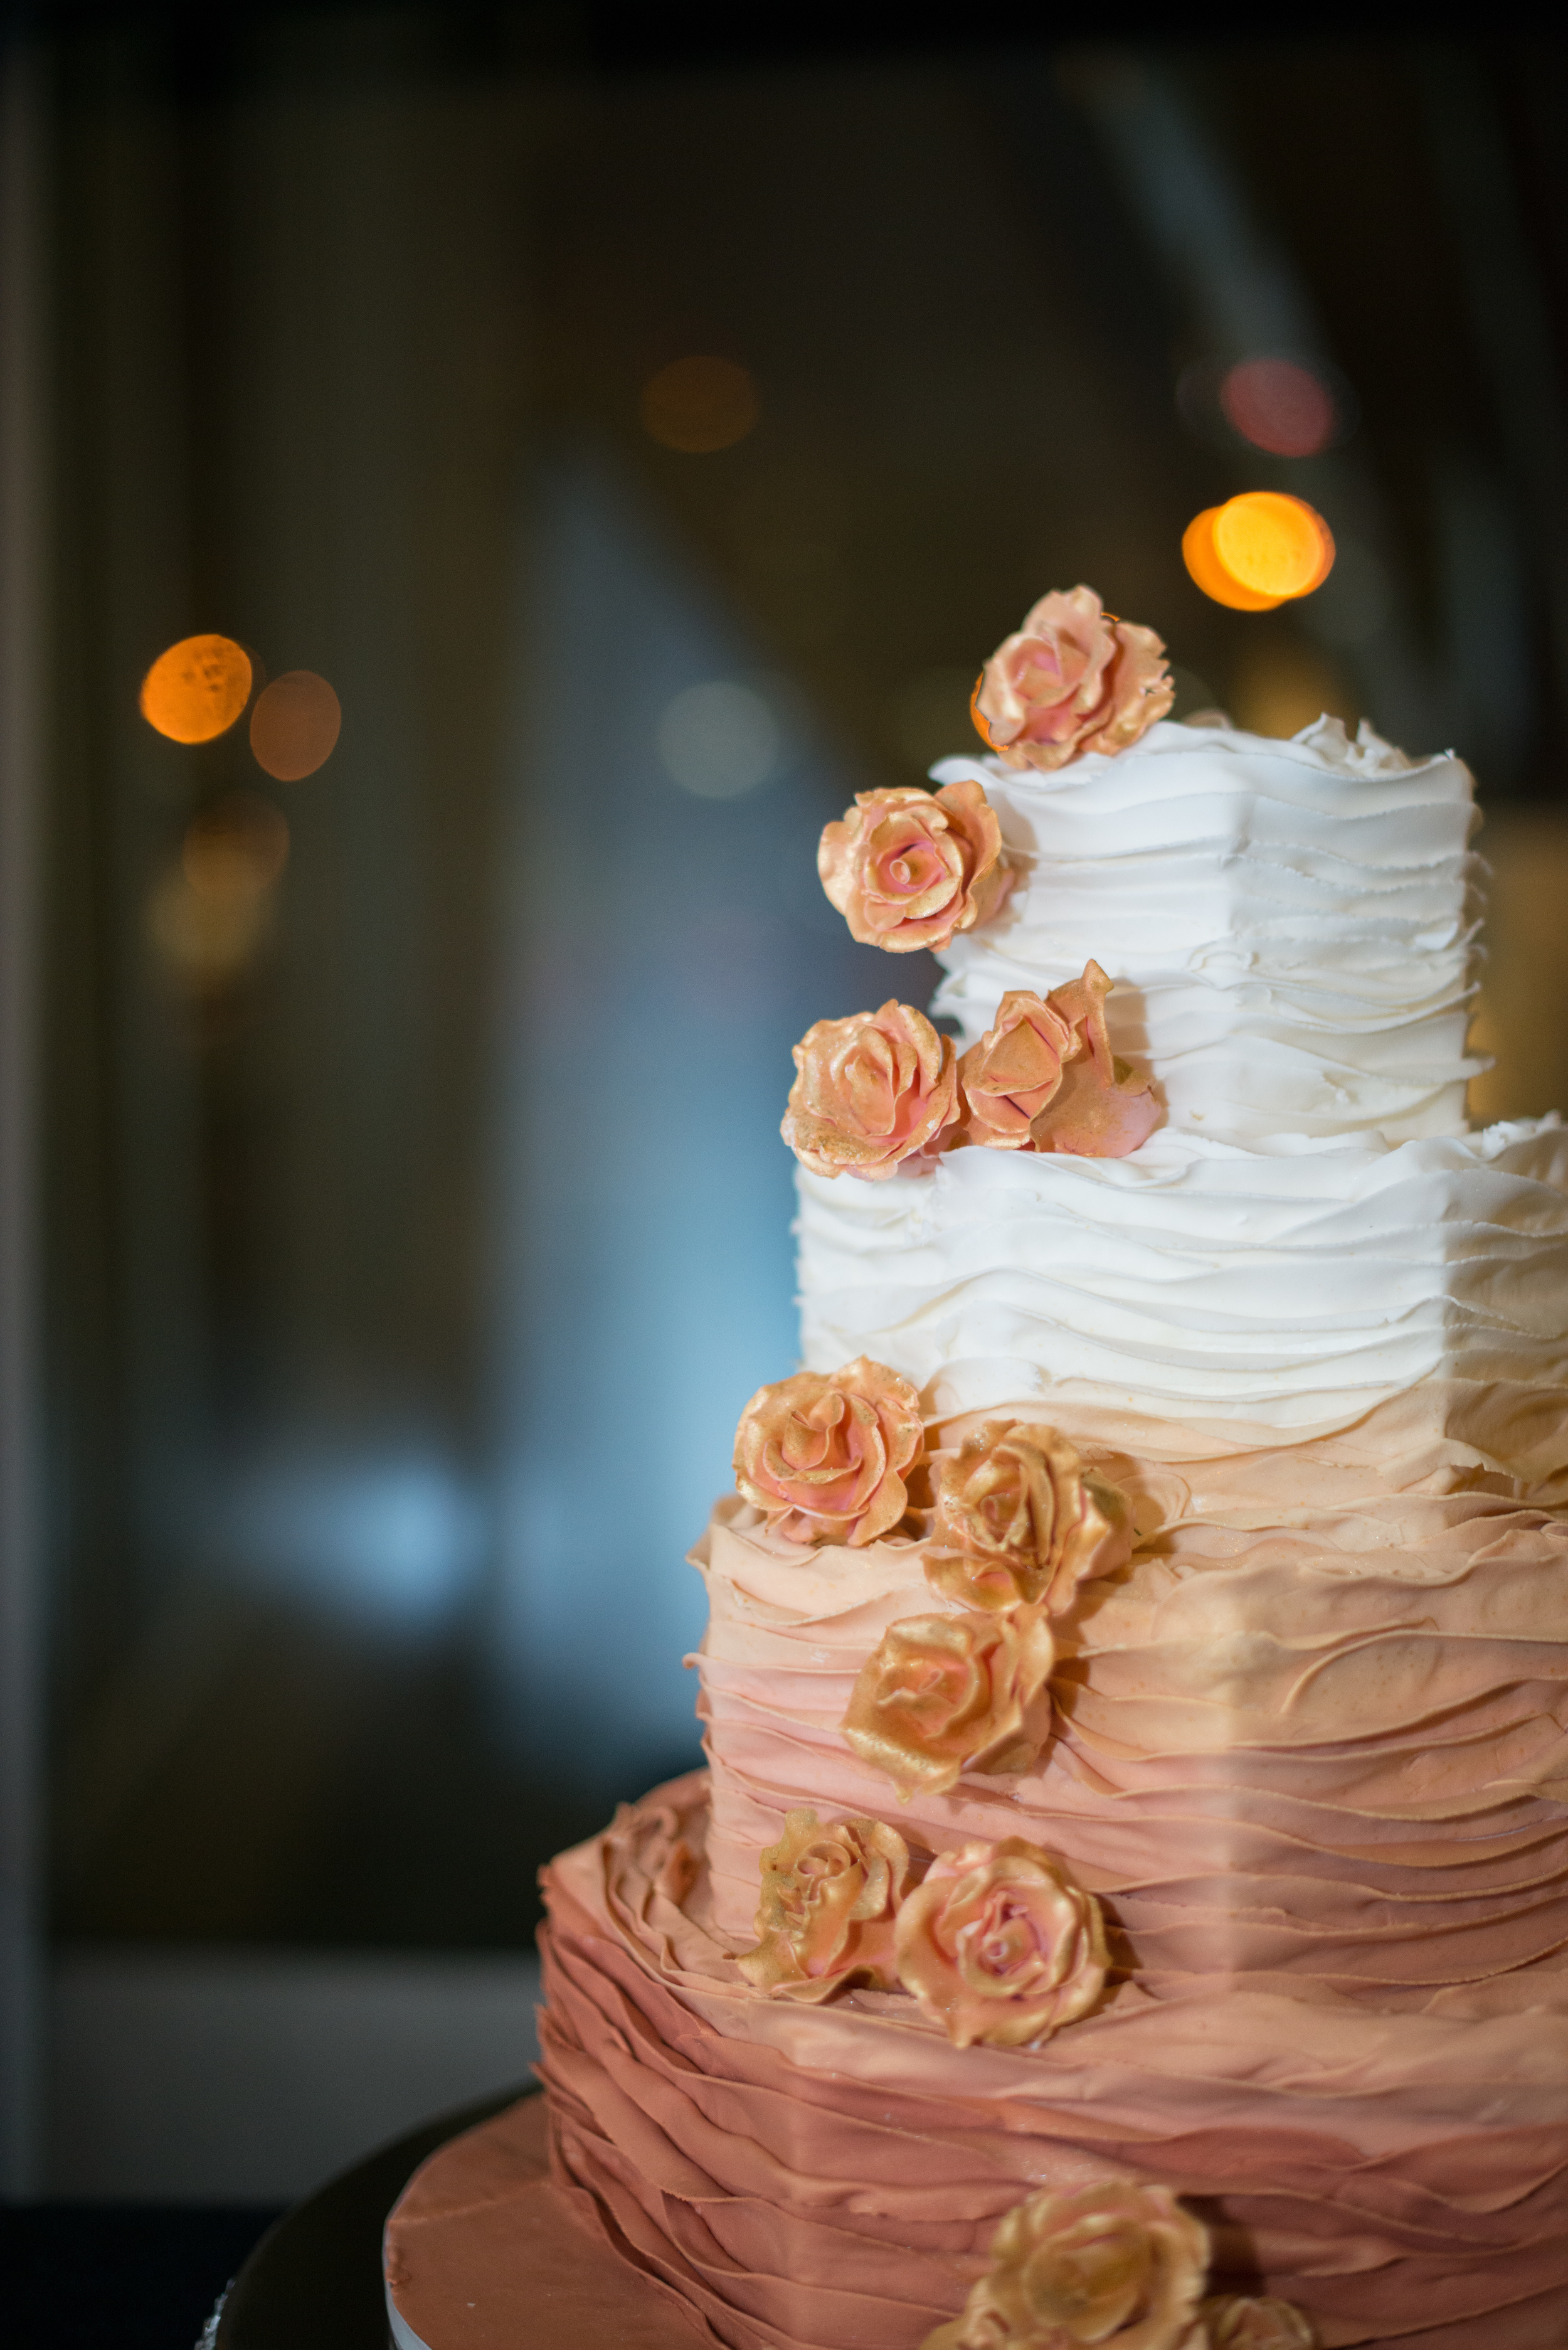 Acowsay_Cinema_MN_Wedding_Cake_2.jpg